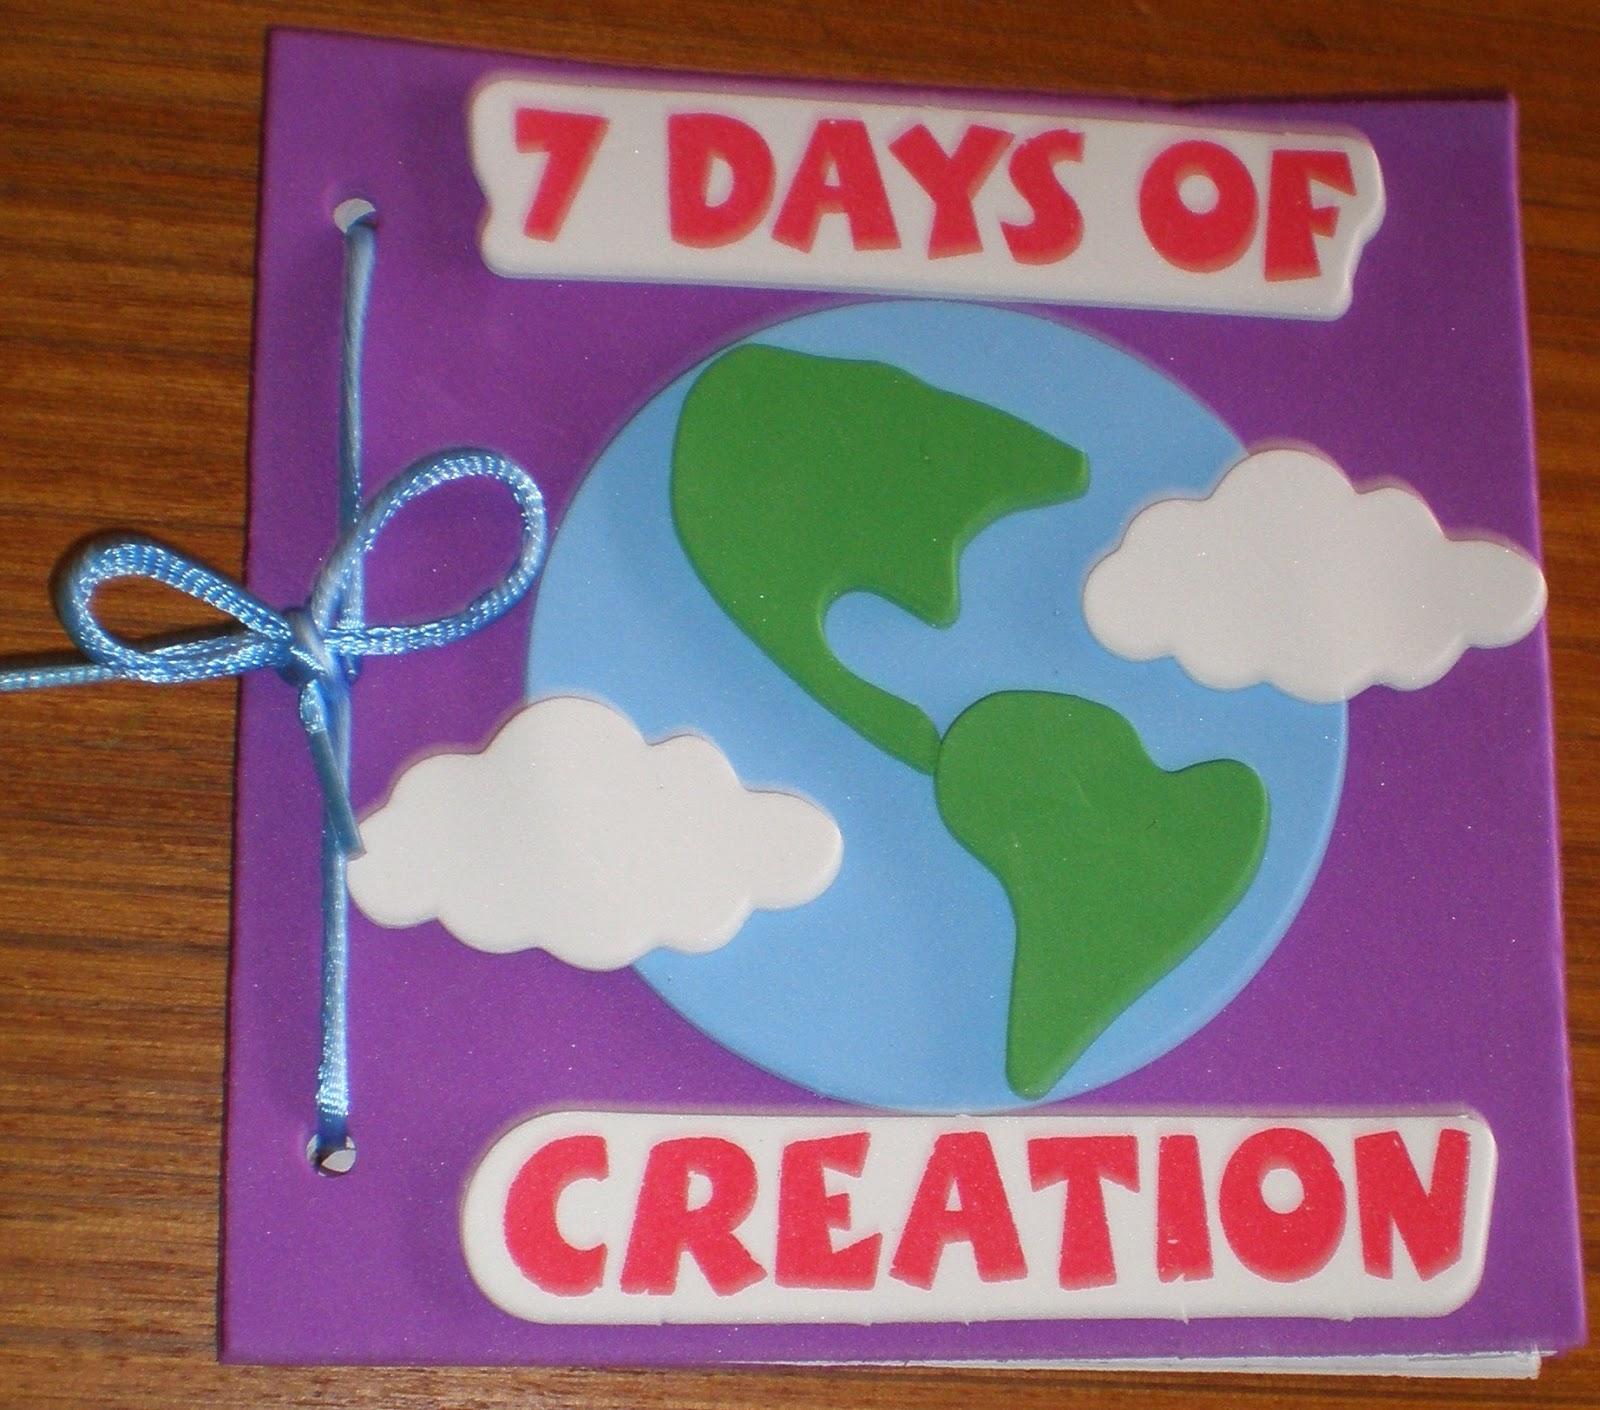 Petersham Bible Book & Tract Depot: 7 Days of Creation ...